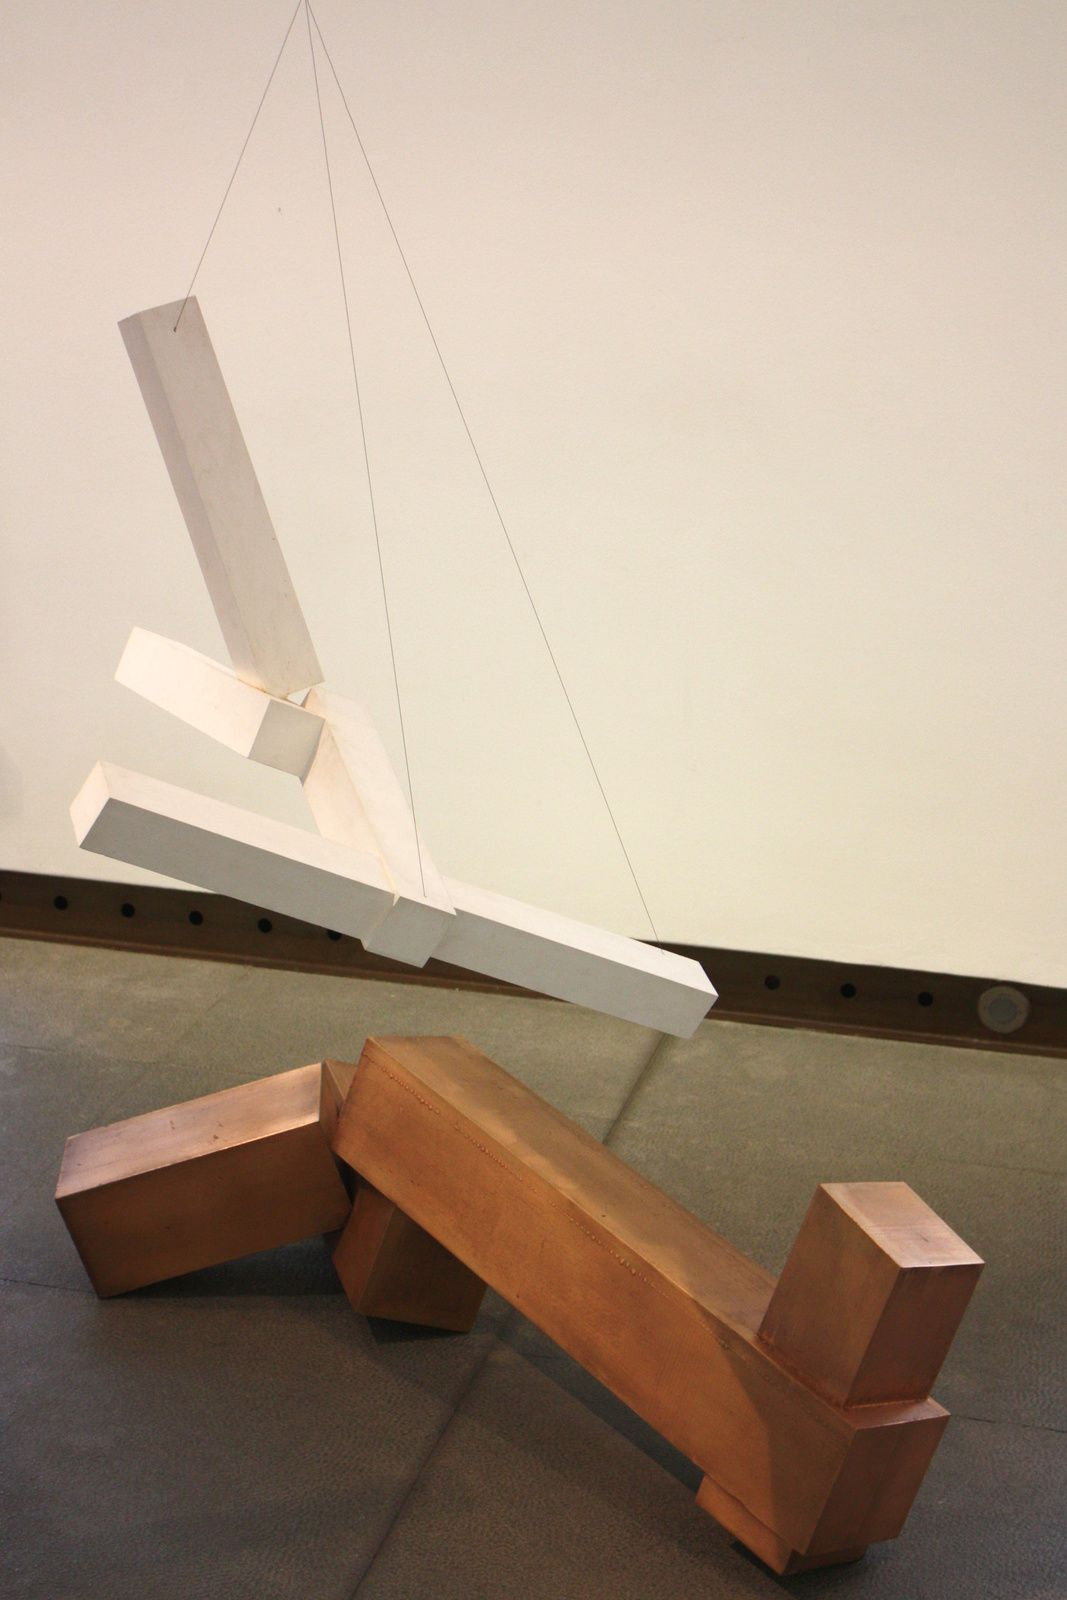 """Sans titre"", 2001-2002 de Joël SHAPIRO Courtesy Galerie Karsten Greve Paris"